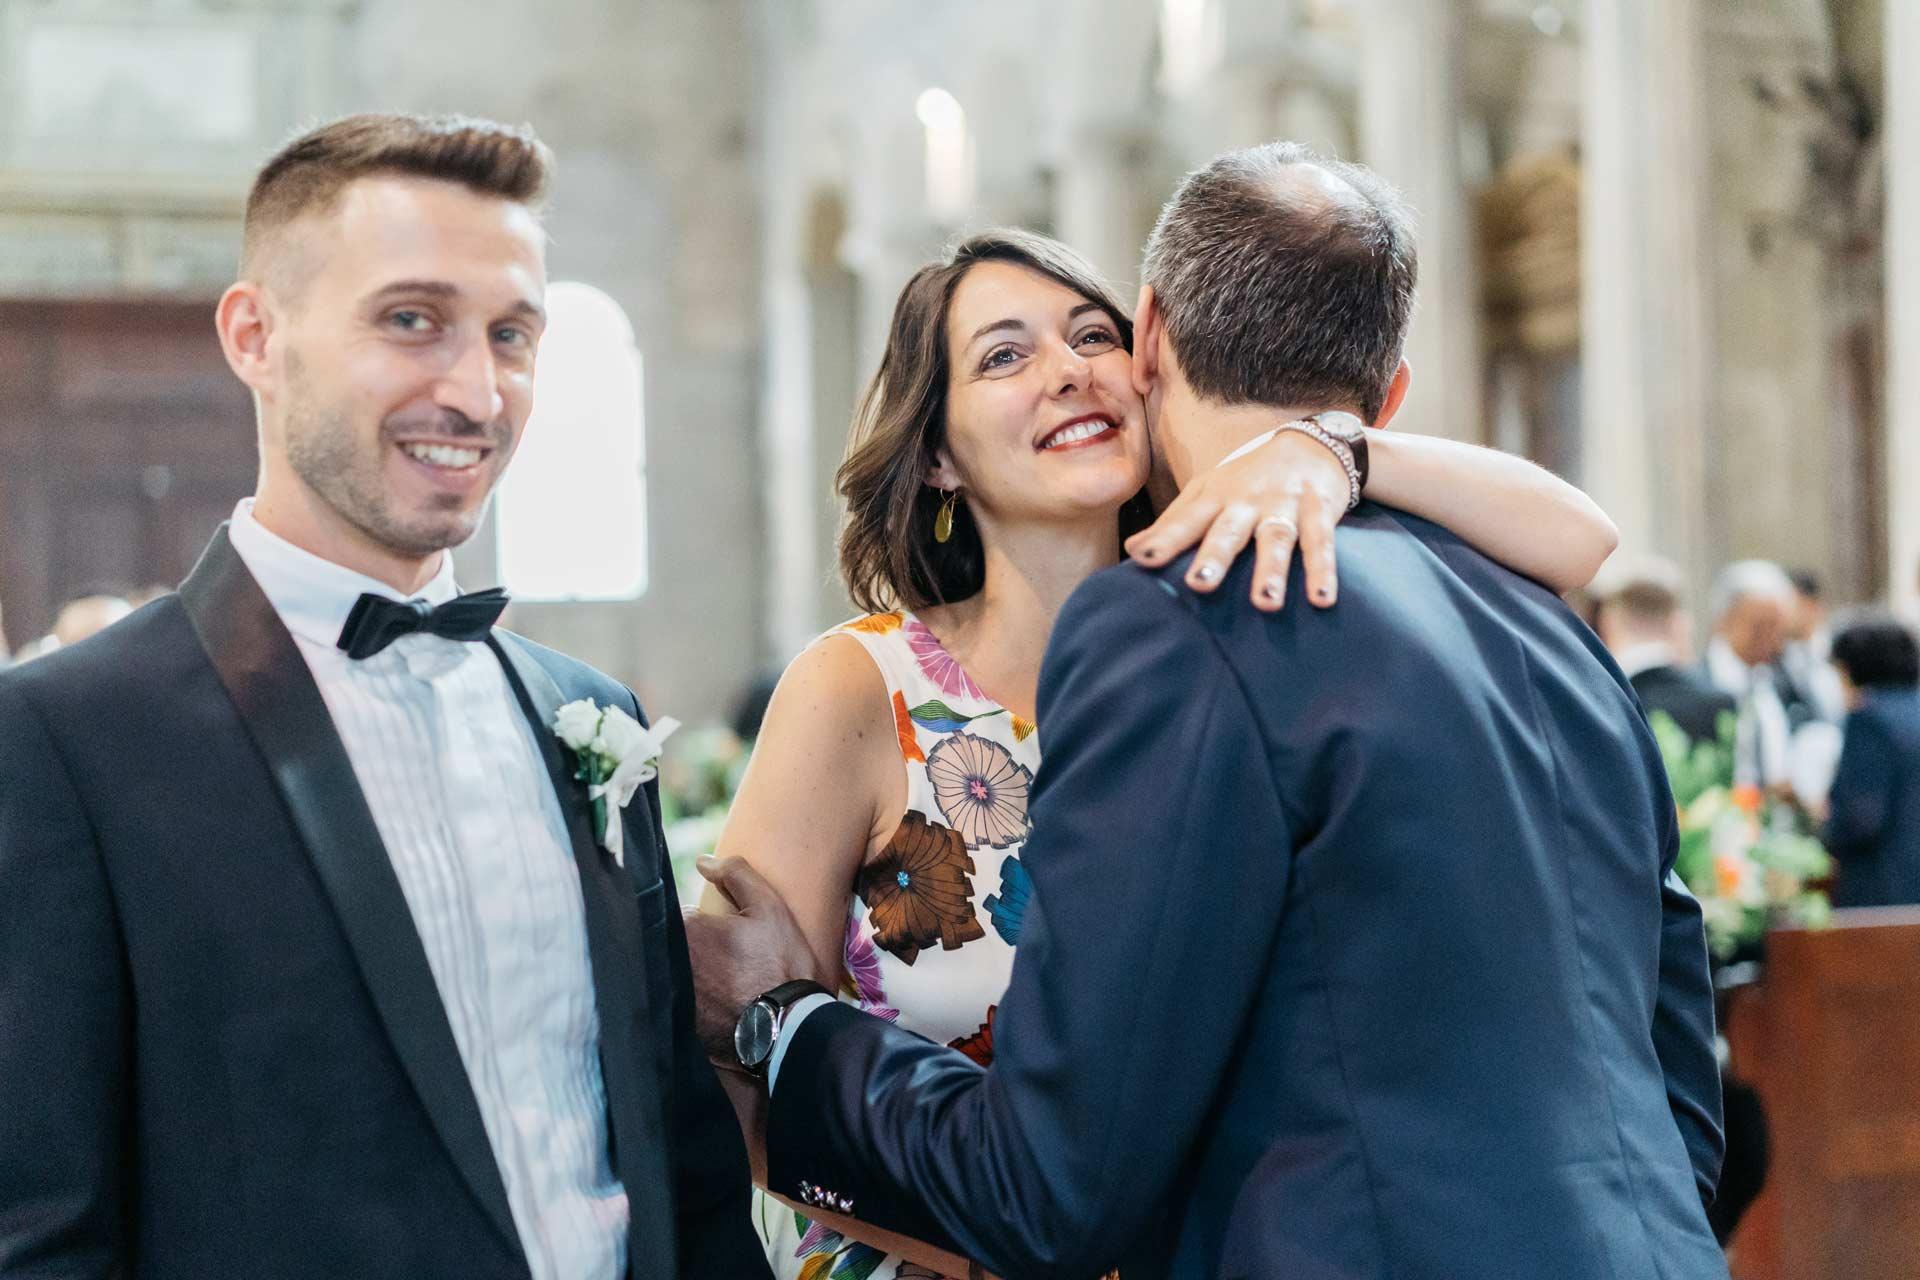 fotografo-matrimonio-reportage-10-C&M-simone-nunzi